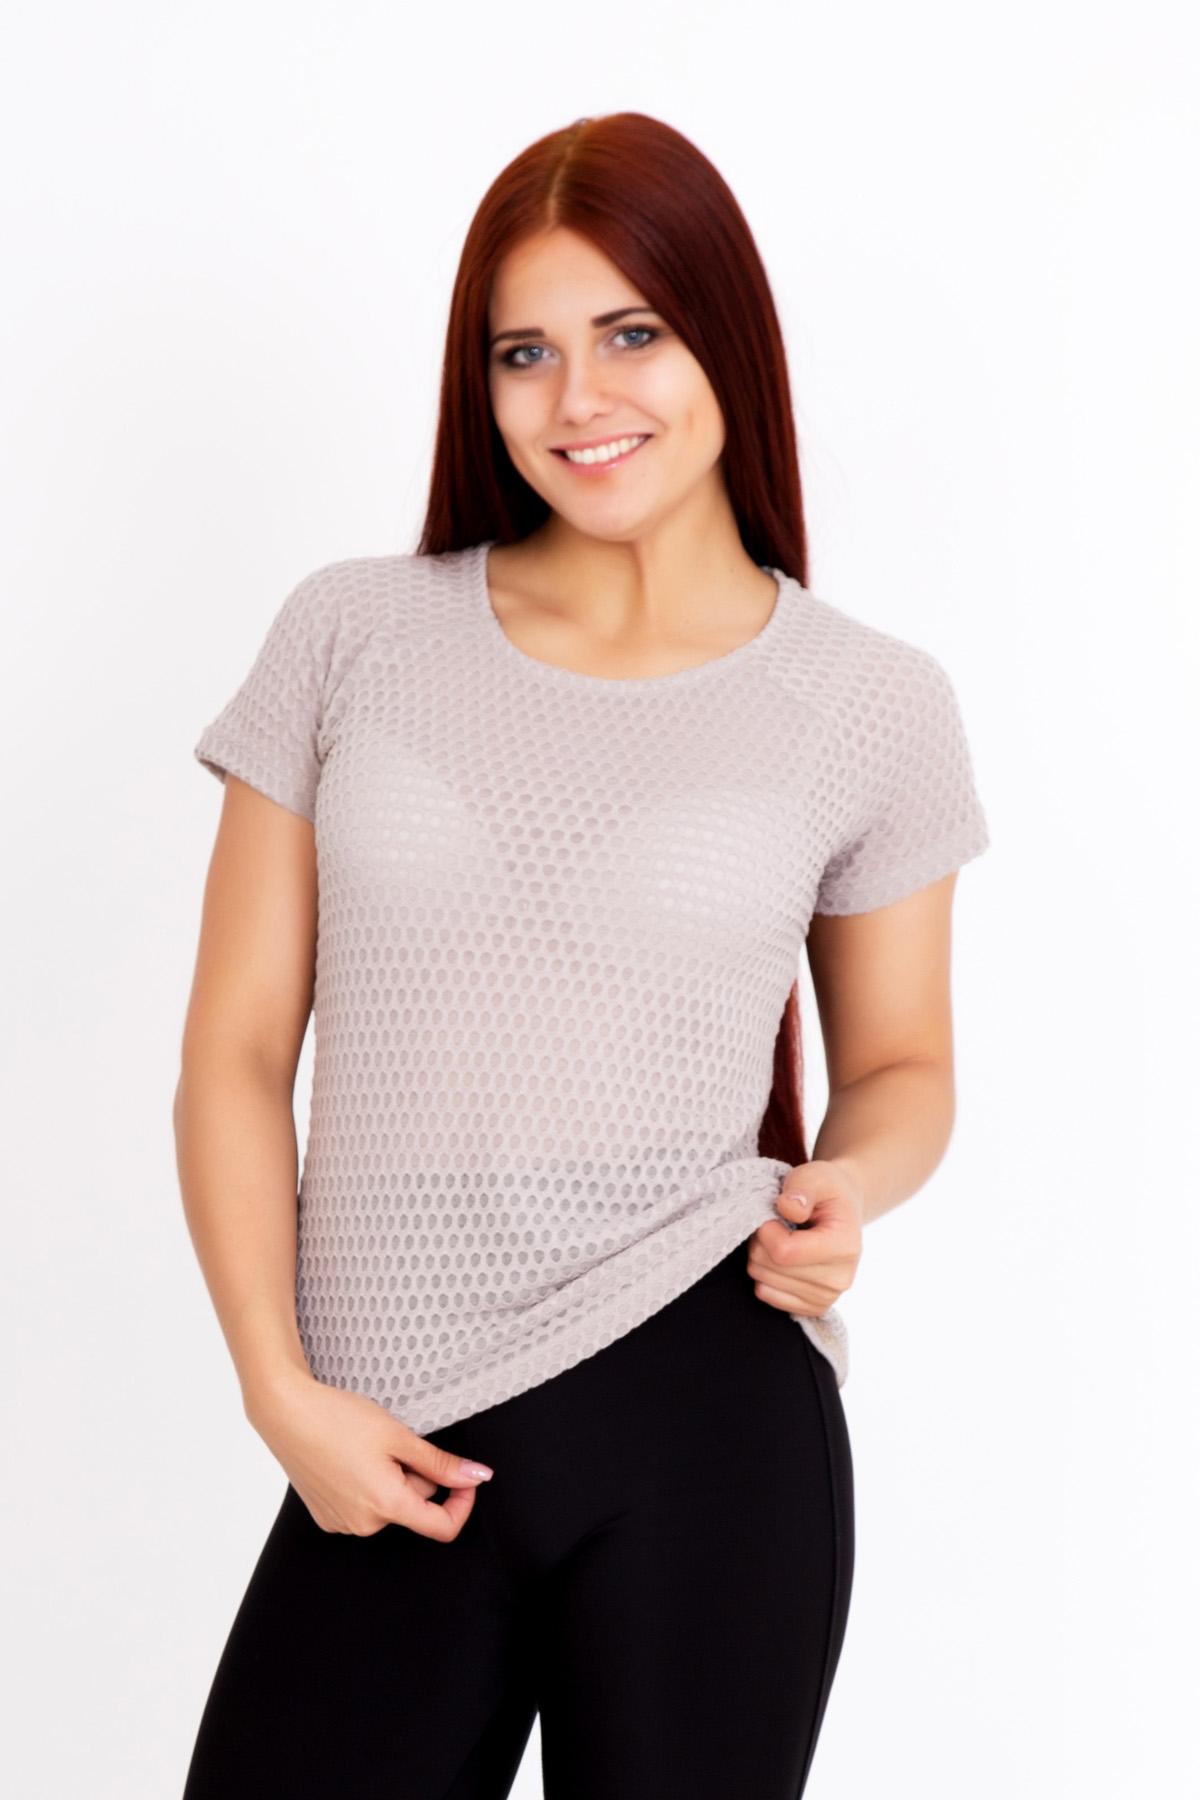 Жен. блуза Ажур Бежевый р. 48Блузы<br>Обхват груди:96 см<br>Обхват талии:78 см<br>Обхват бедер:104 см<br>Длина по спинке:56 см<br>Рост:167 см<br><br>Тип: Жен. блуза<br>Размер: 48<br>Материал: Вискоза